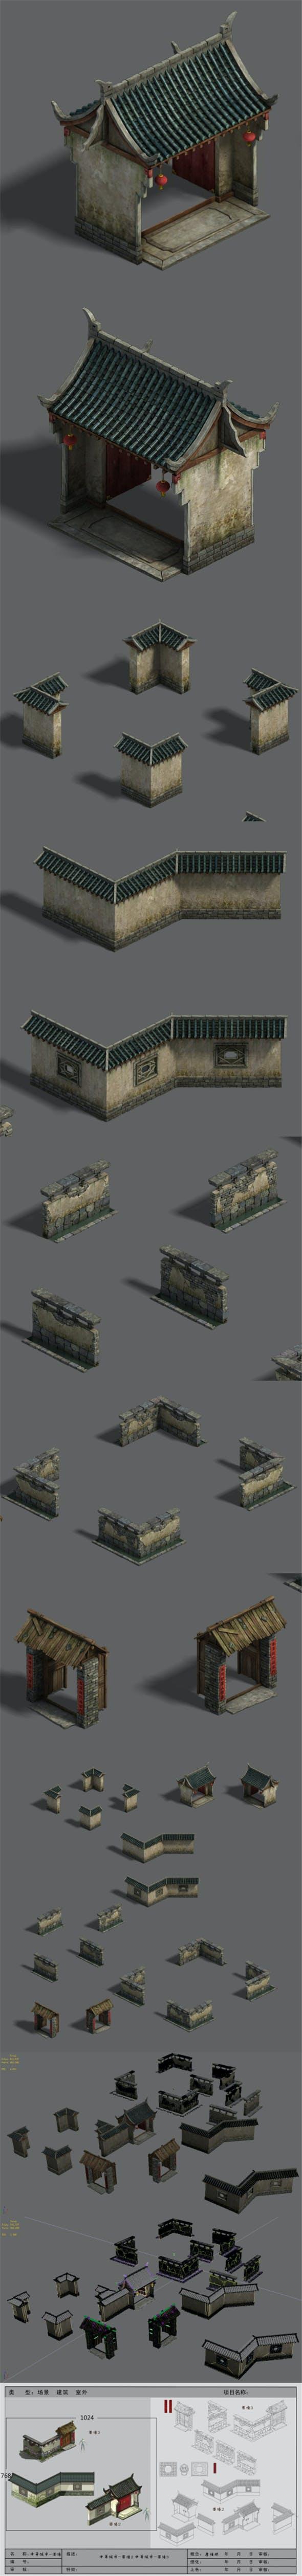 Medium City - Wall 02 - 3DOcean Item for Sale